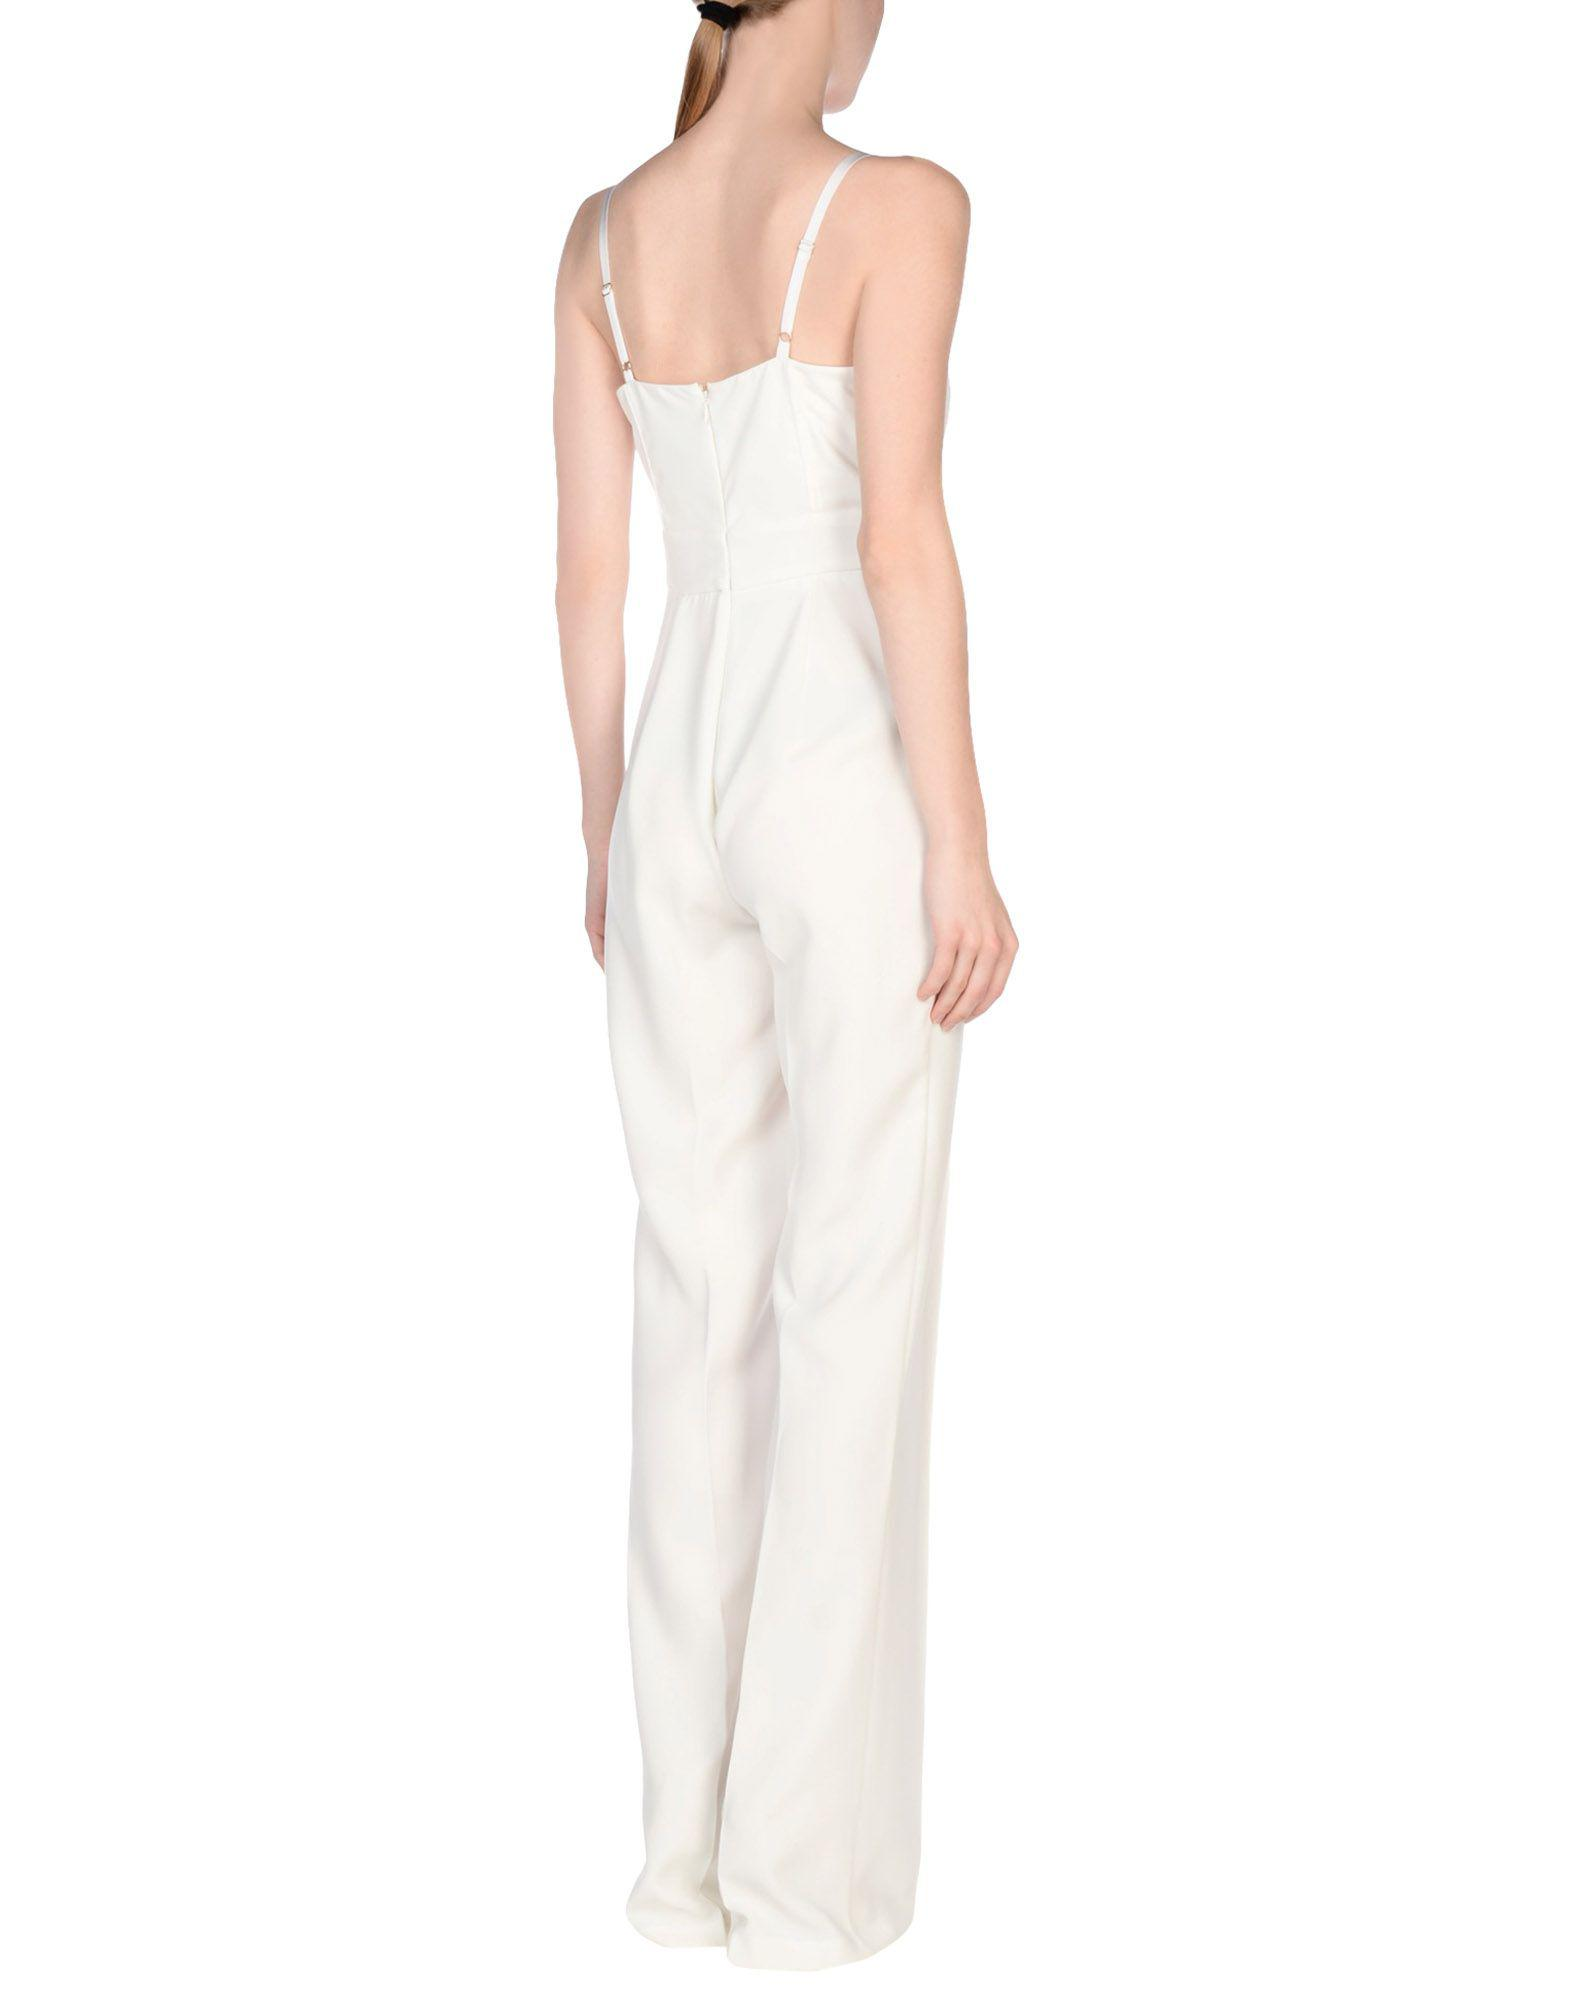 77ec39419fa Lyst - Elisabetta Franchi Jumpsuit in White